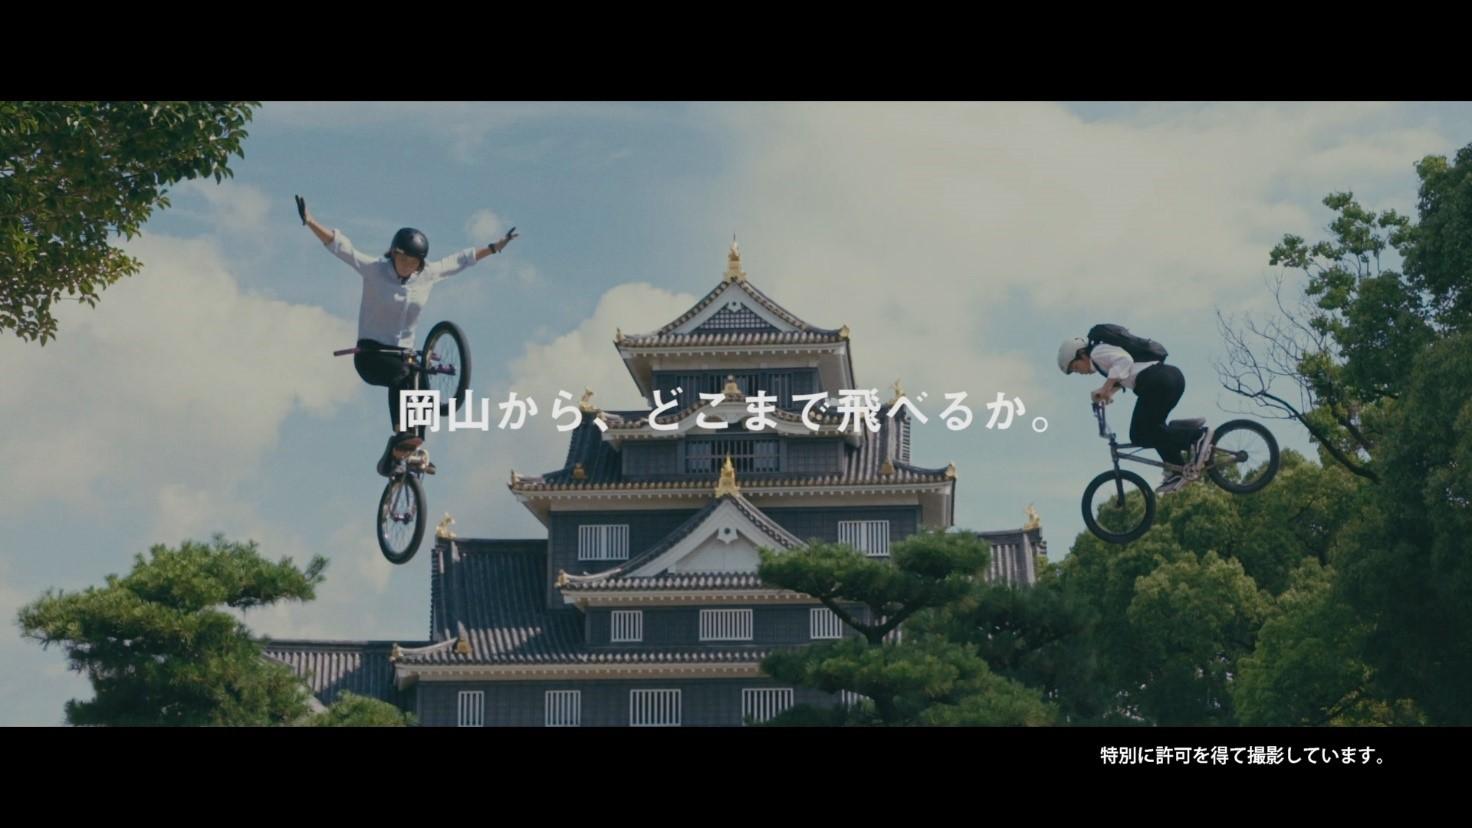 BMXのまち おかやま、PR動画公開【岡山駅前で! 岡山城で! 走って跳んで、岡山市の魅力をアピール】